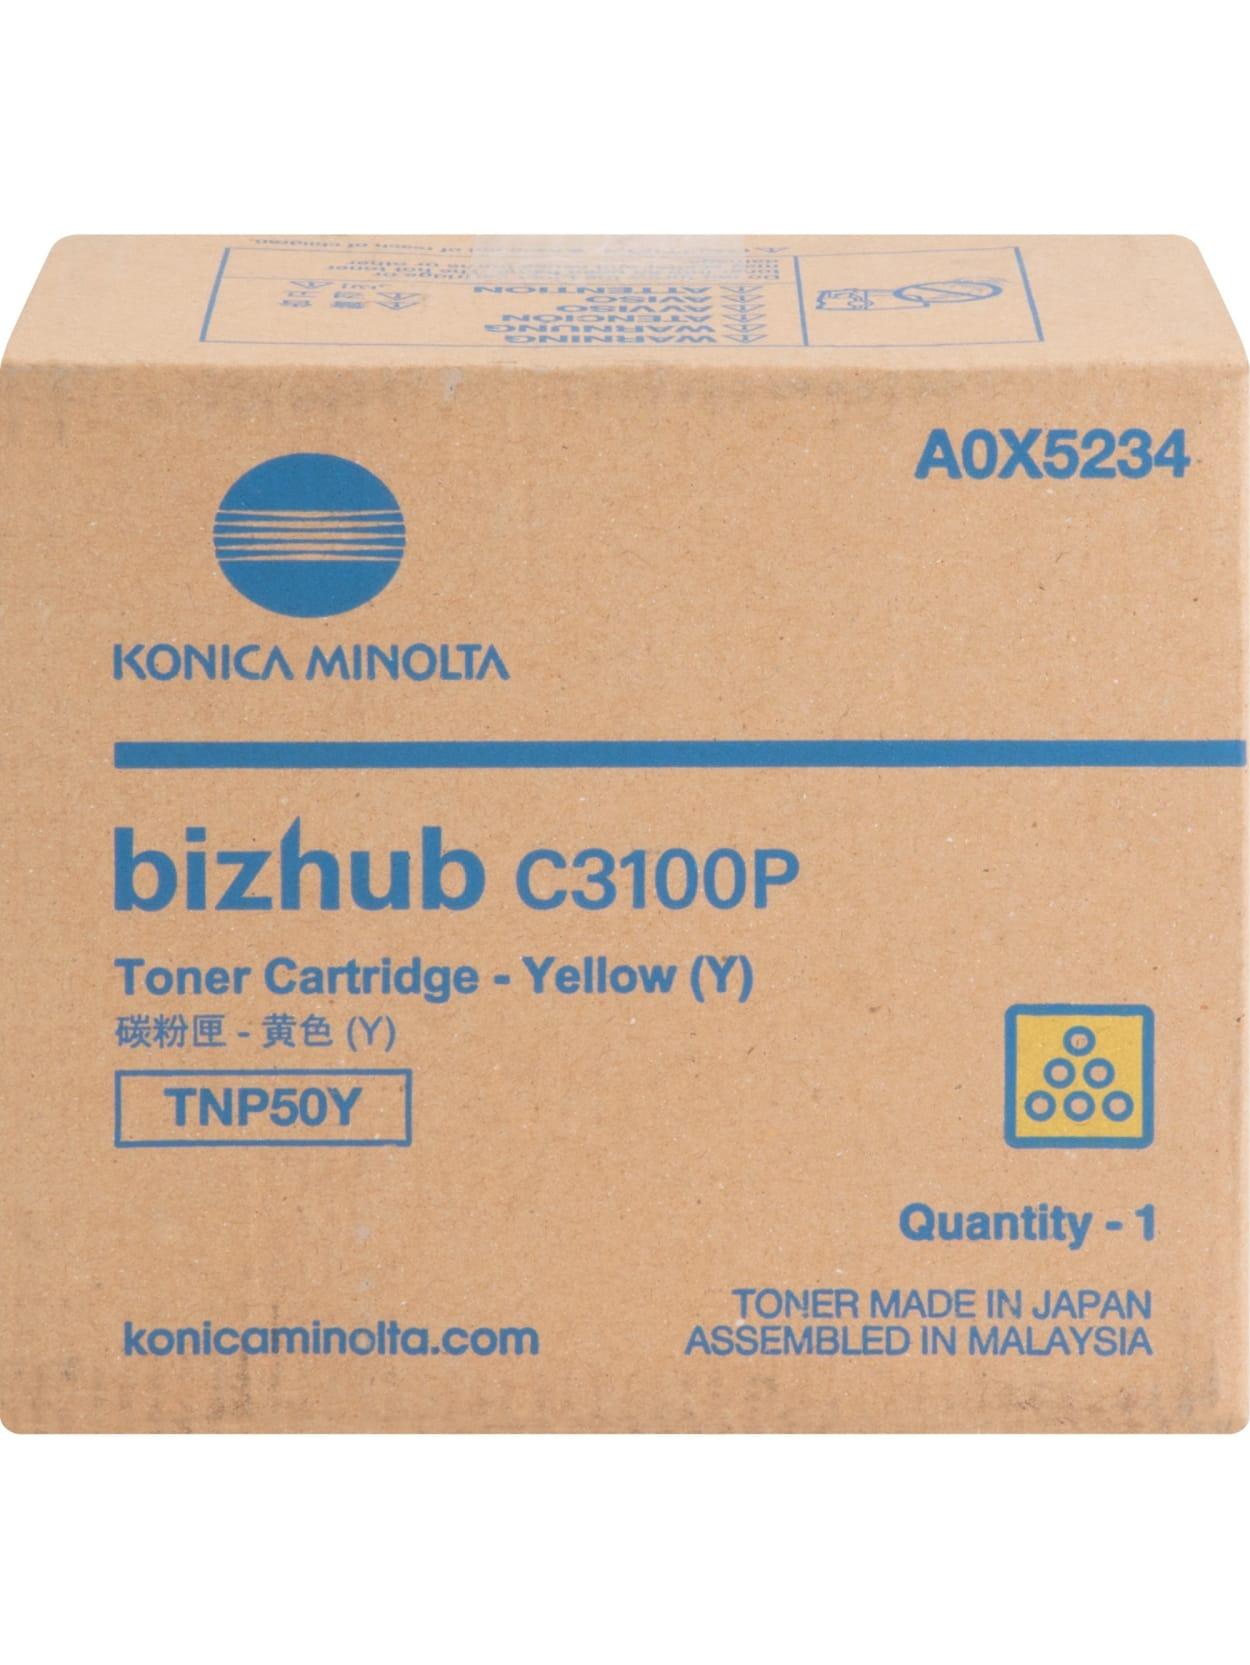 Yellow Konica Minolta TNP50Y Toner Cartridge